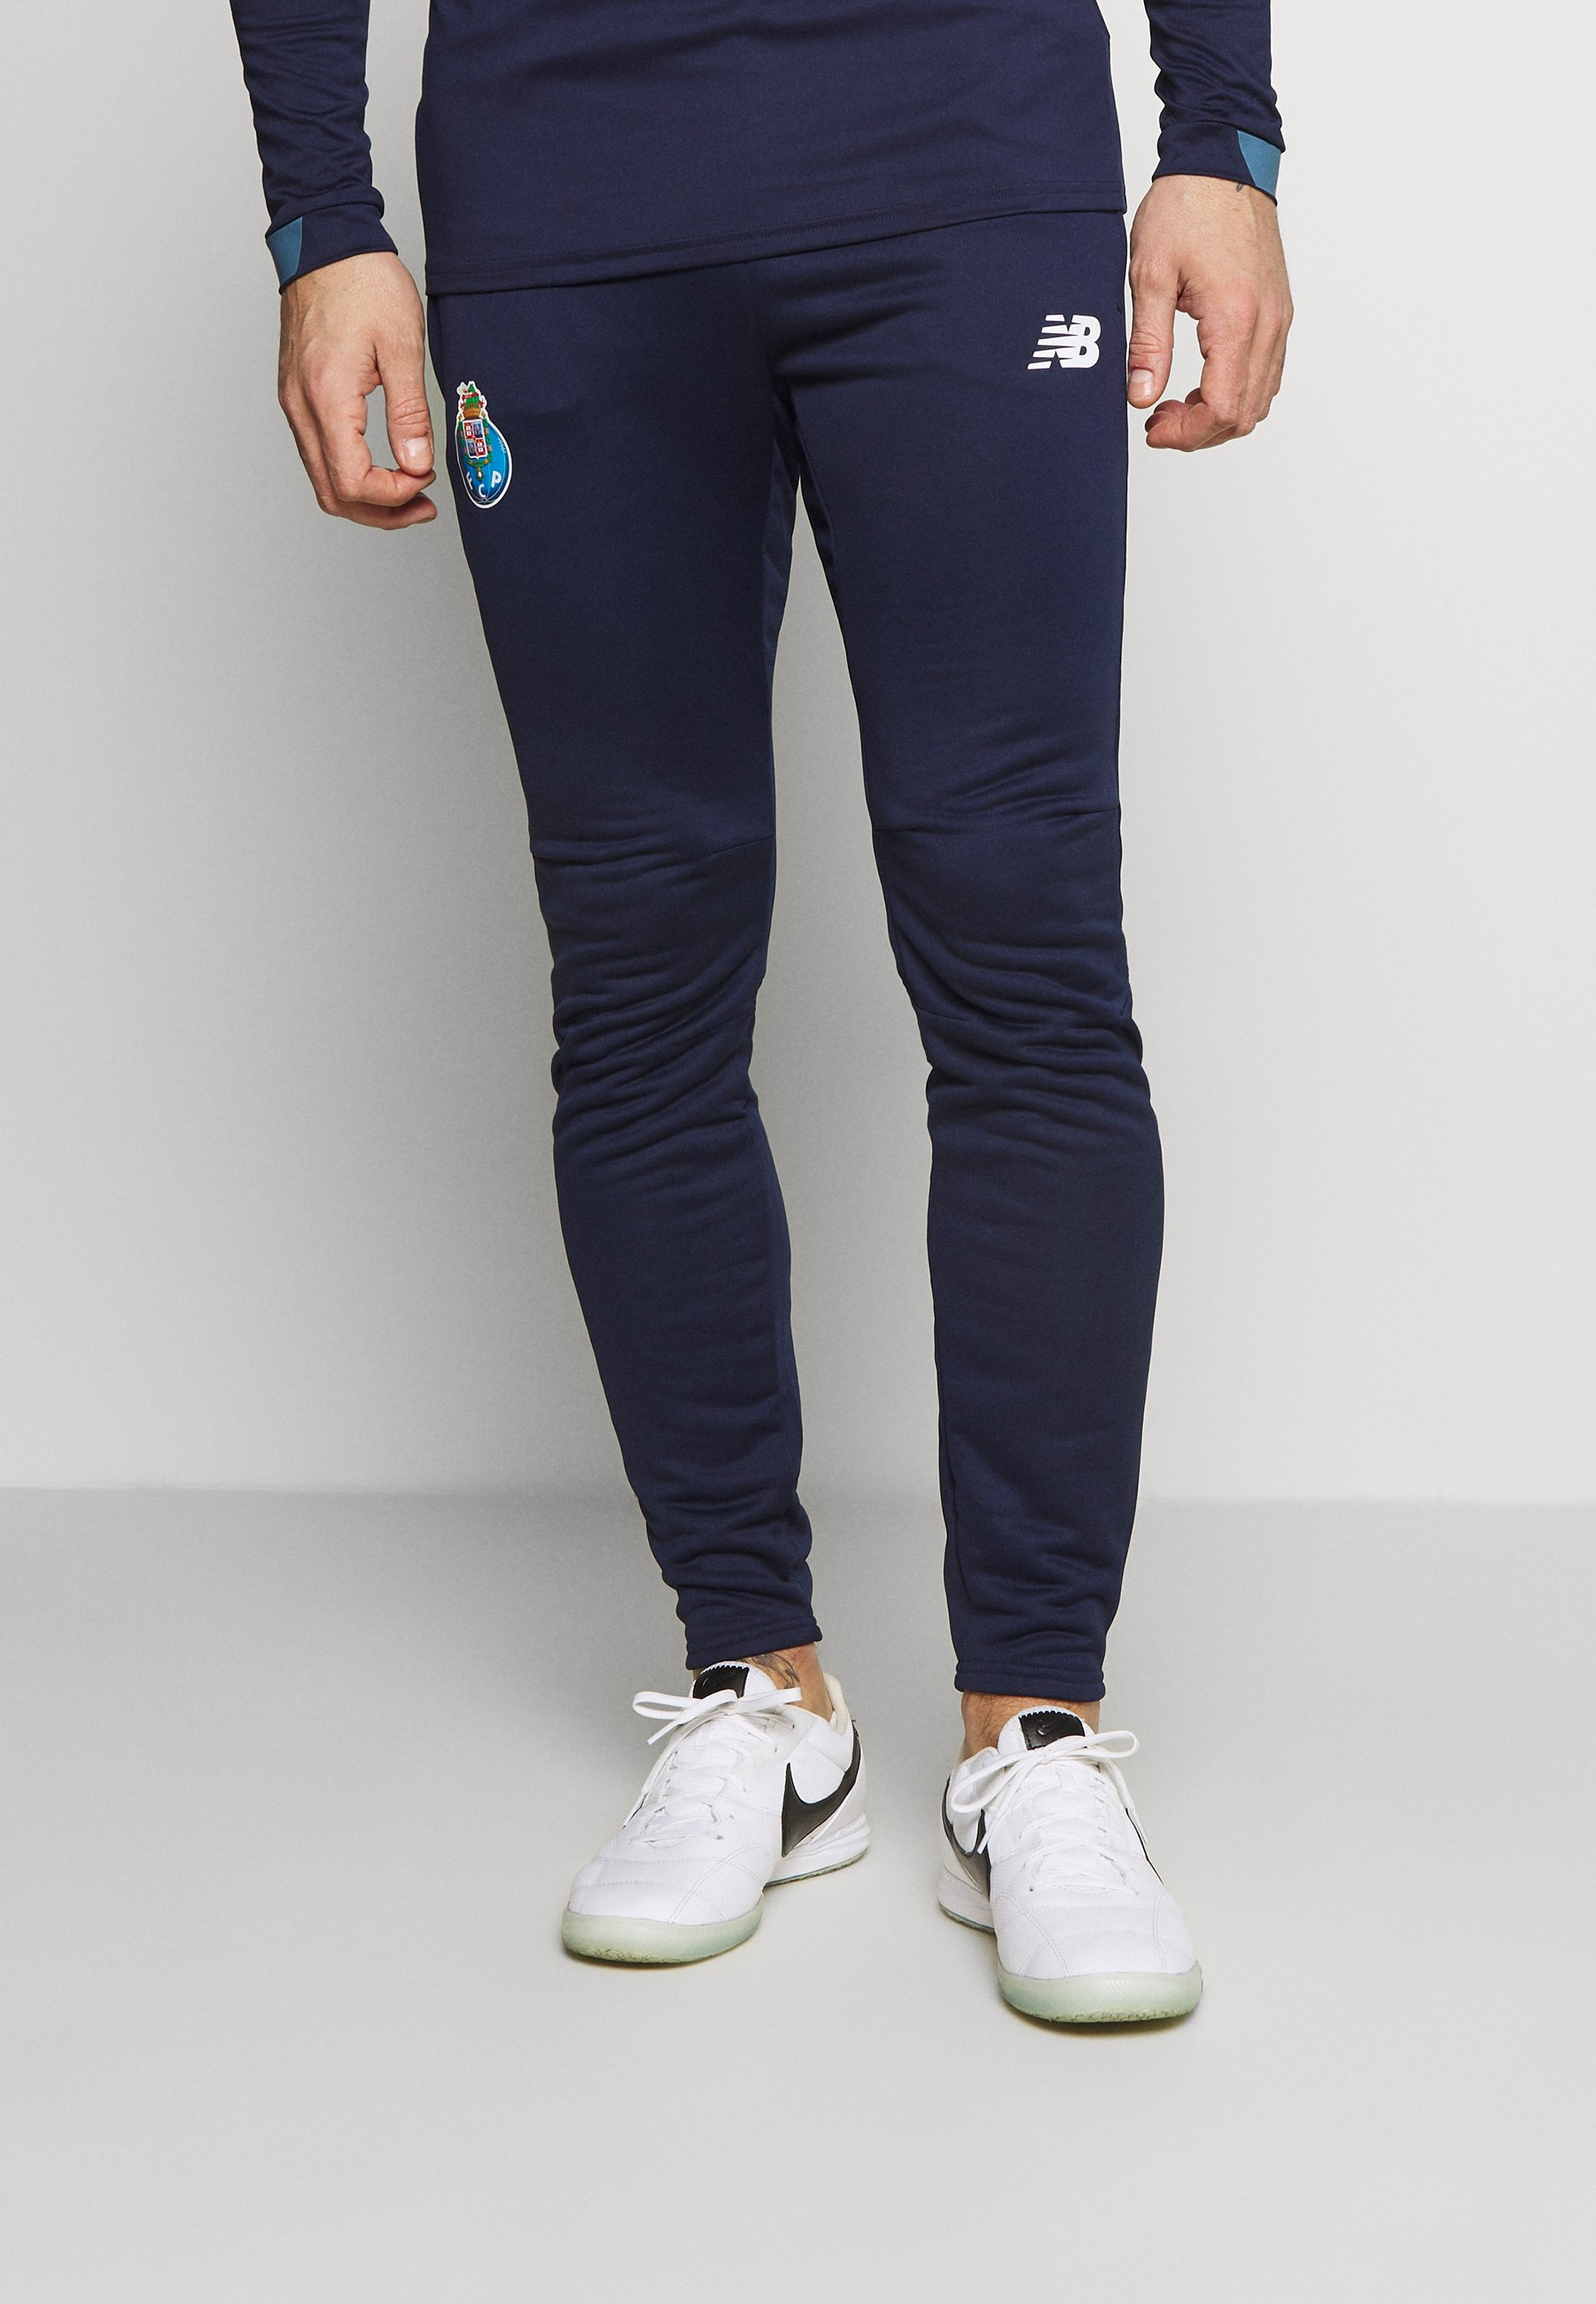 New Balance Pantalones Deportivos Navy Azul Marino Zalando Es